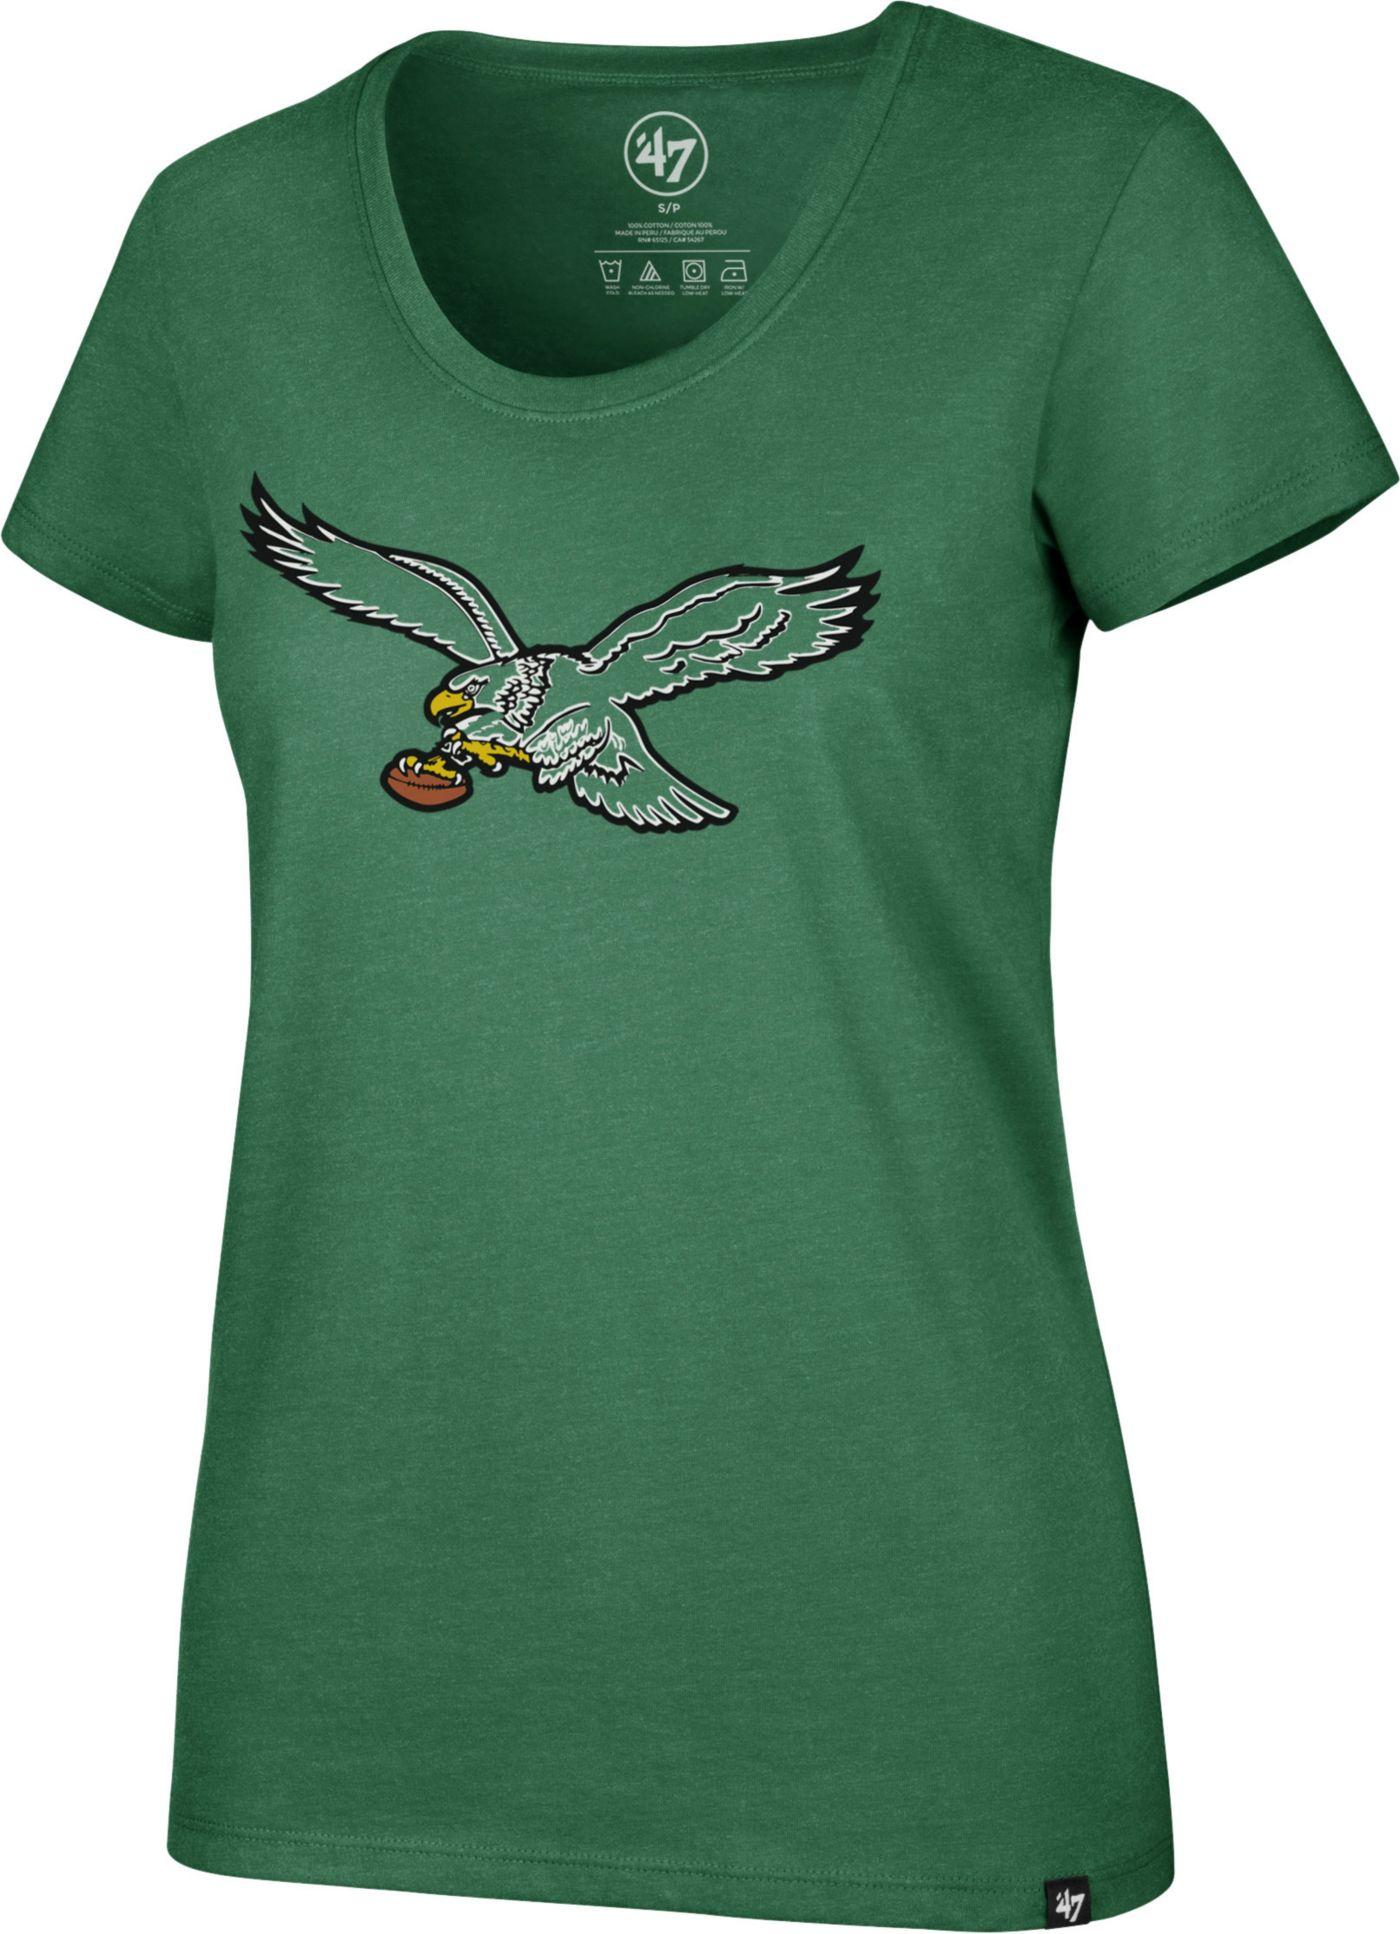 '47 Women's Philadelphia Eagles Historic Club Green T-Shirt